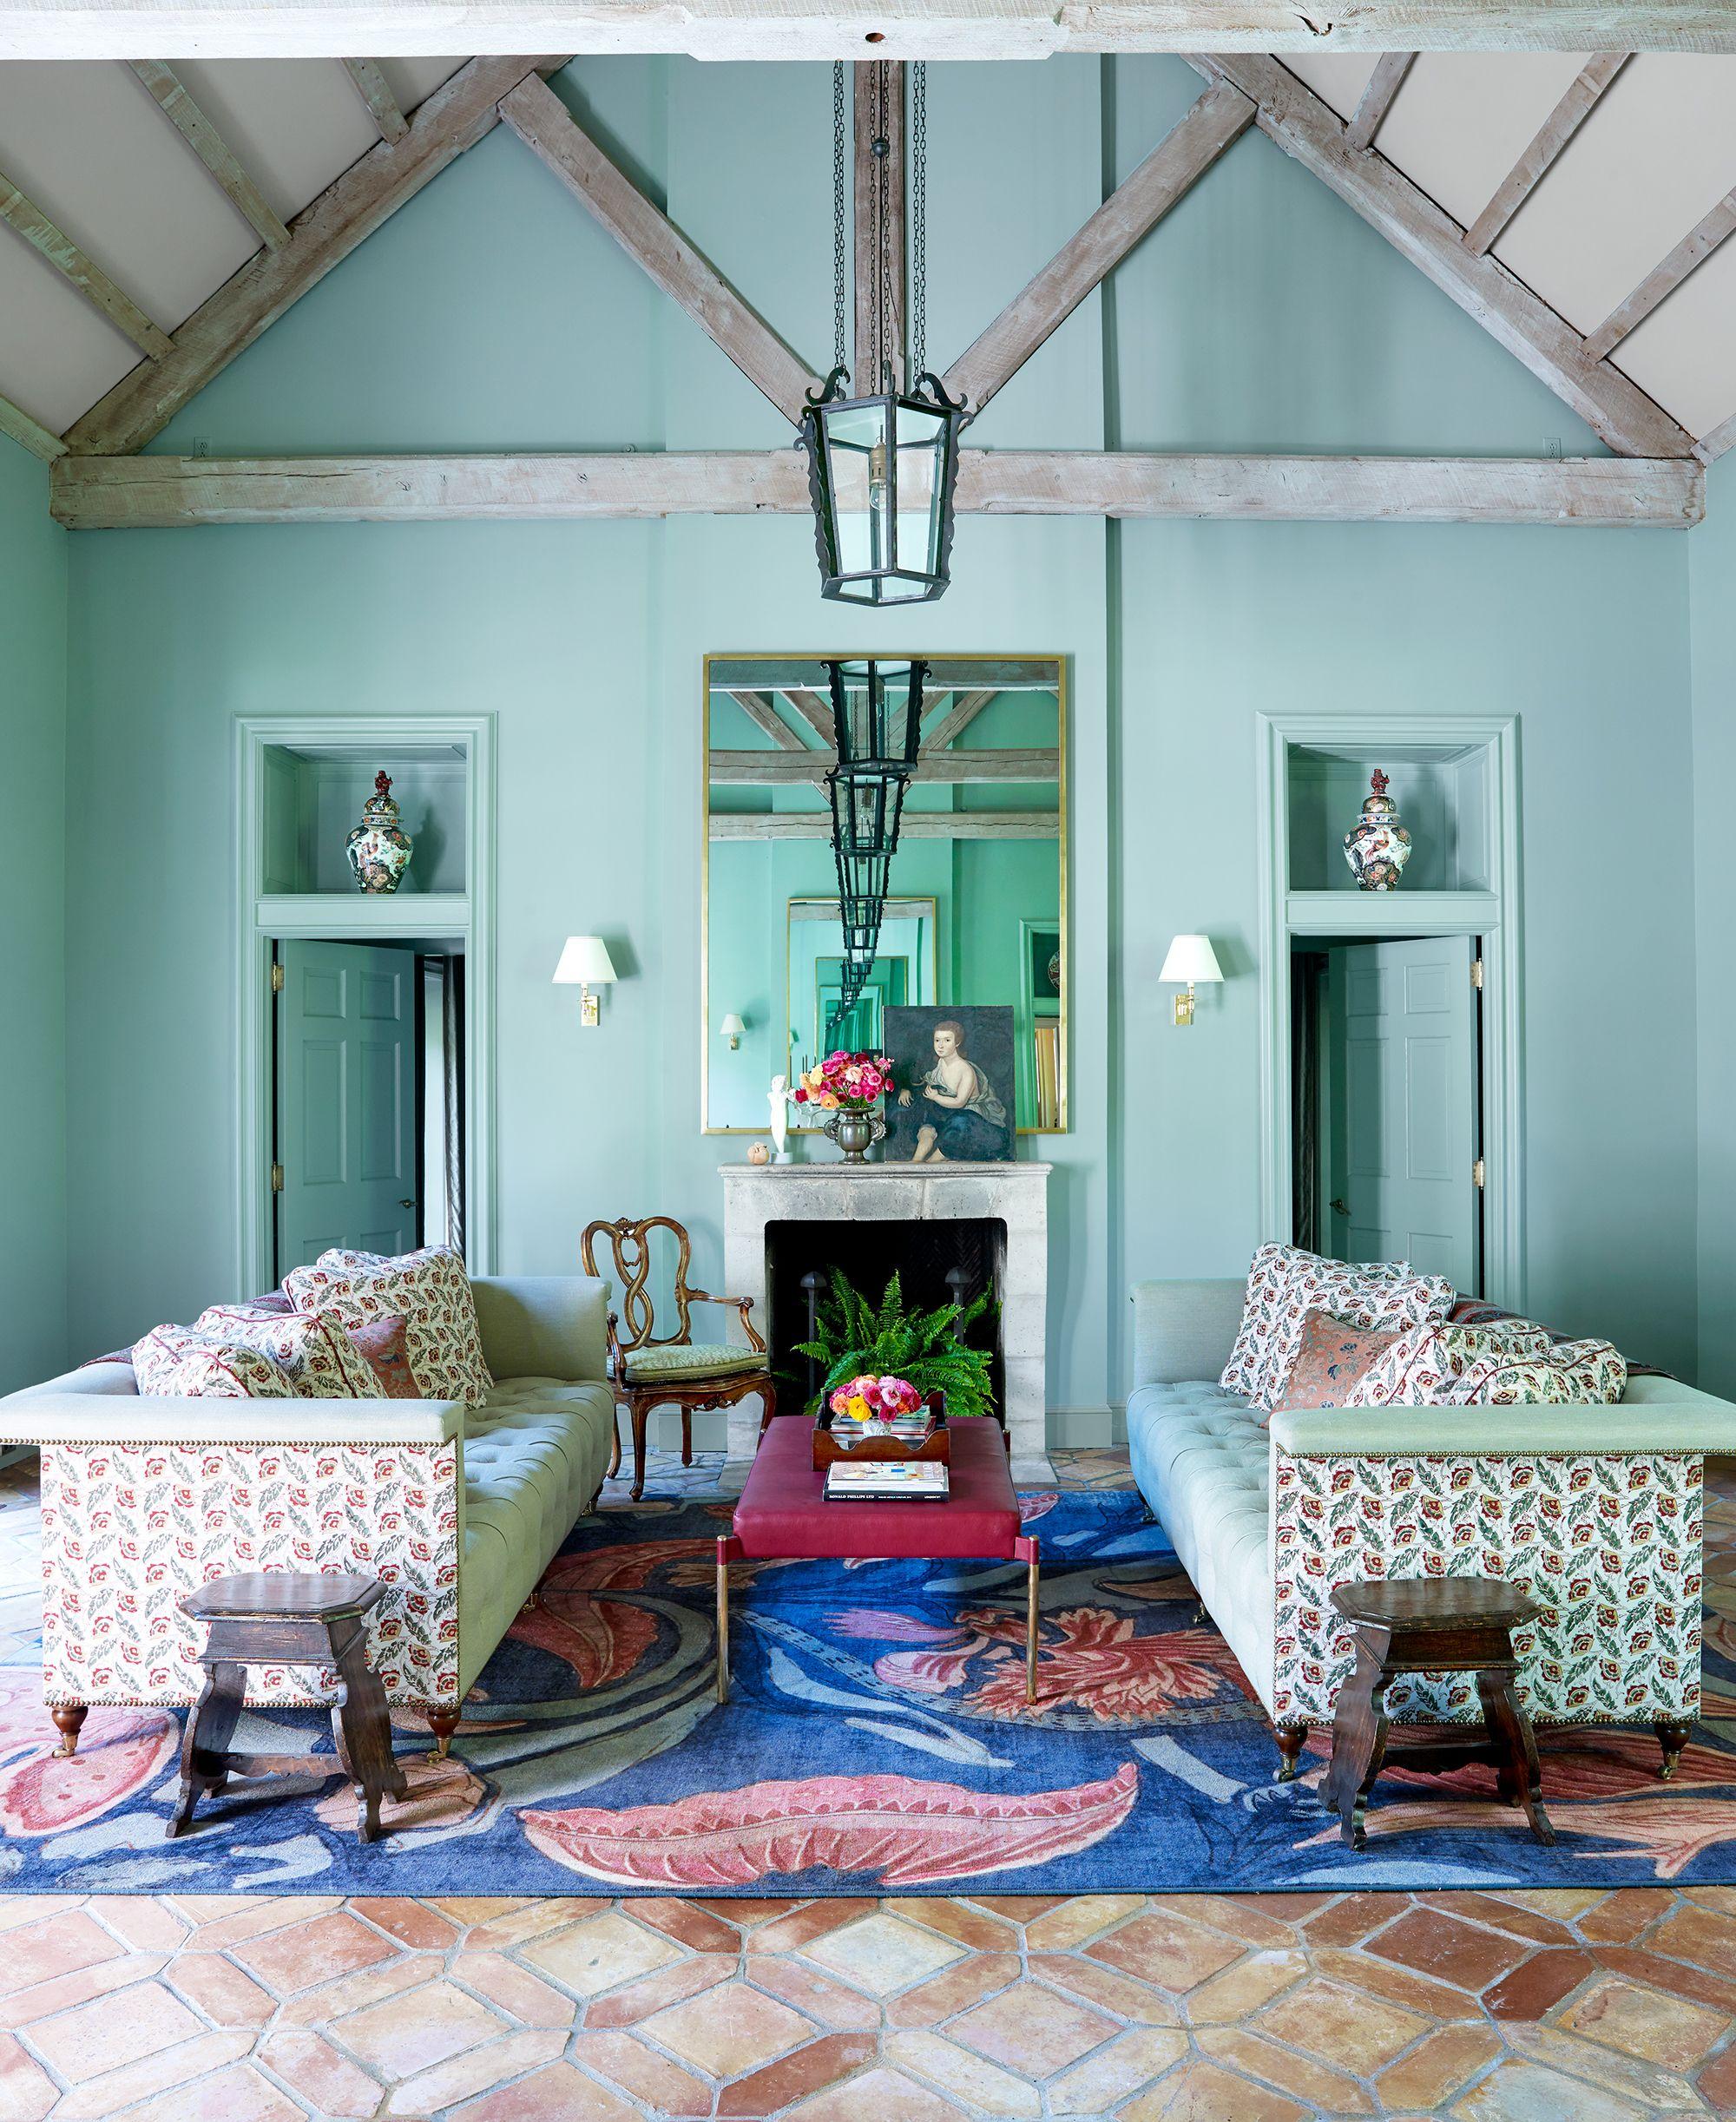 & 40+ Best Living Room Decorating Ideas \u0026 Designs - HouseBeautiful.com